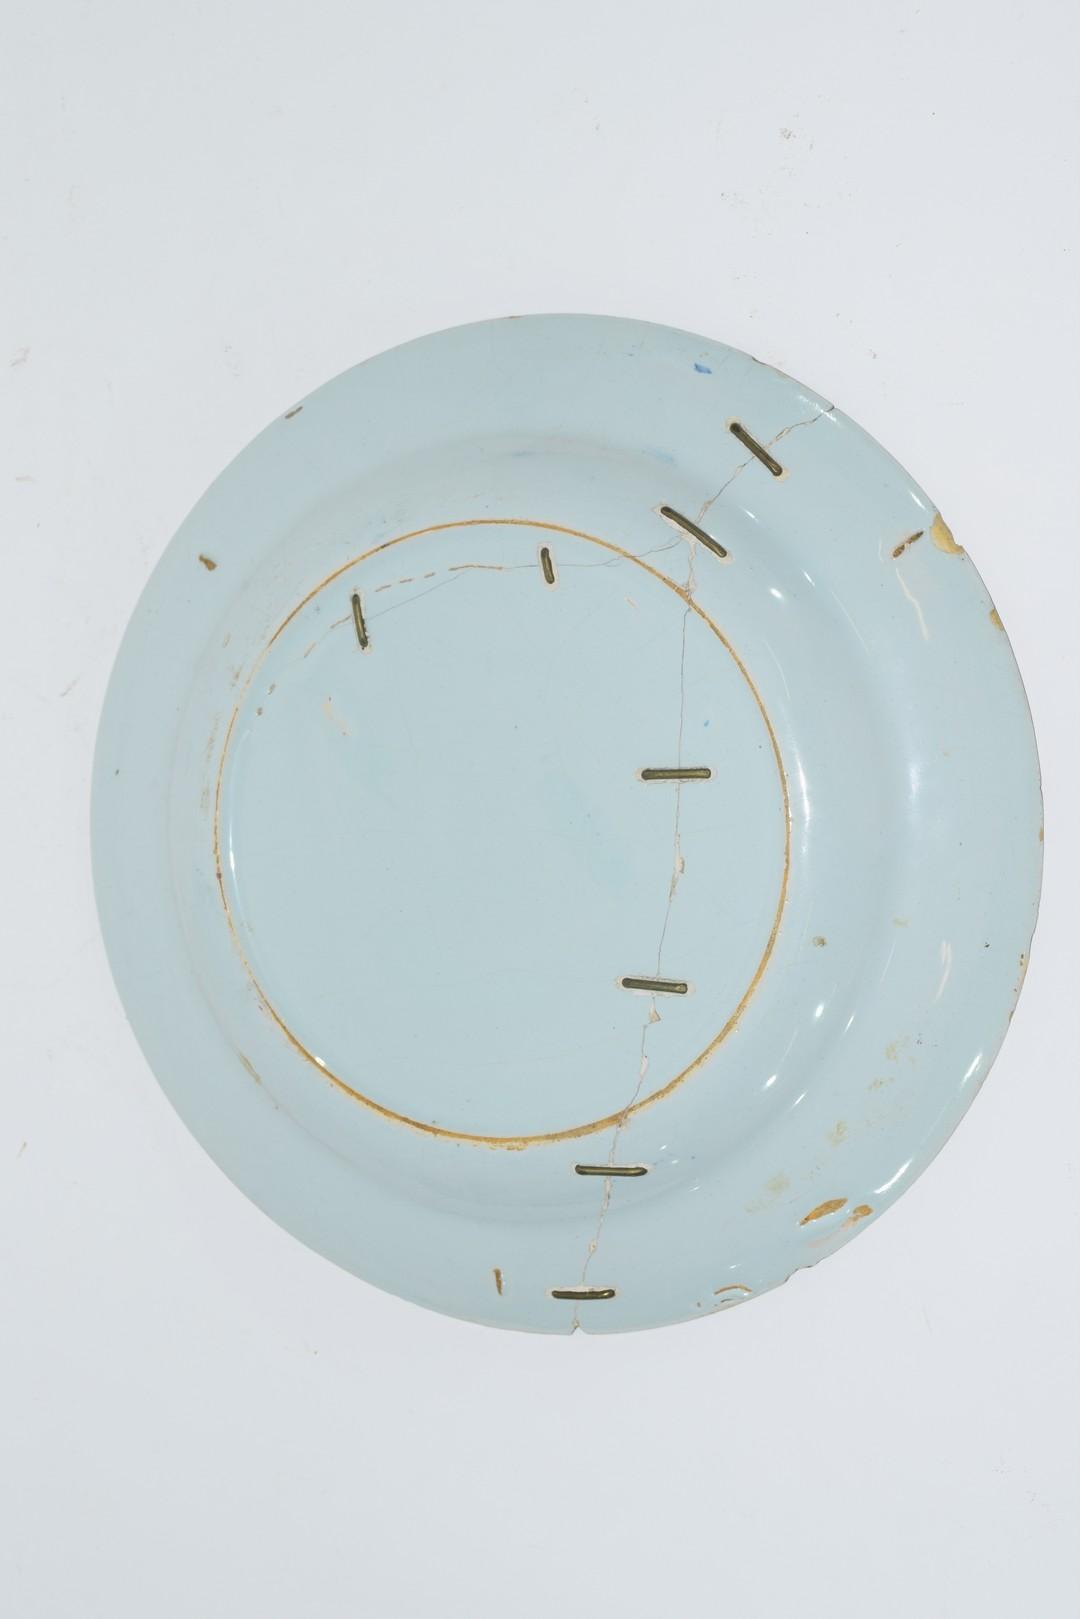 Three 18th century English Delft plates - Image 7 of 7